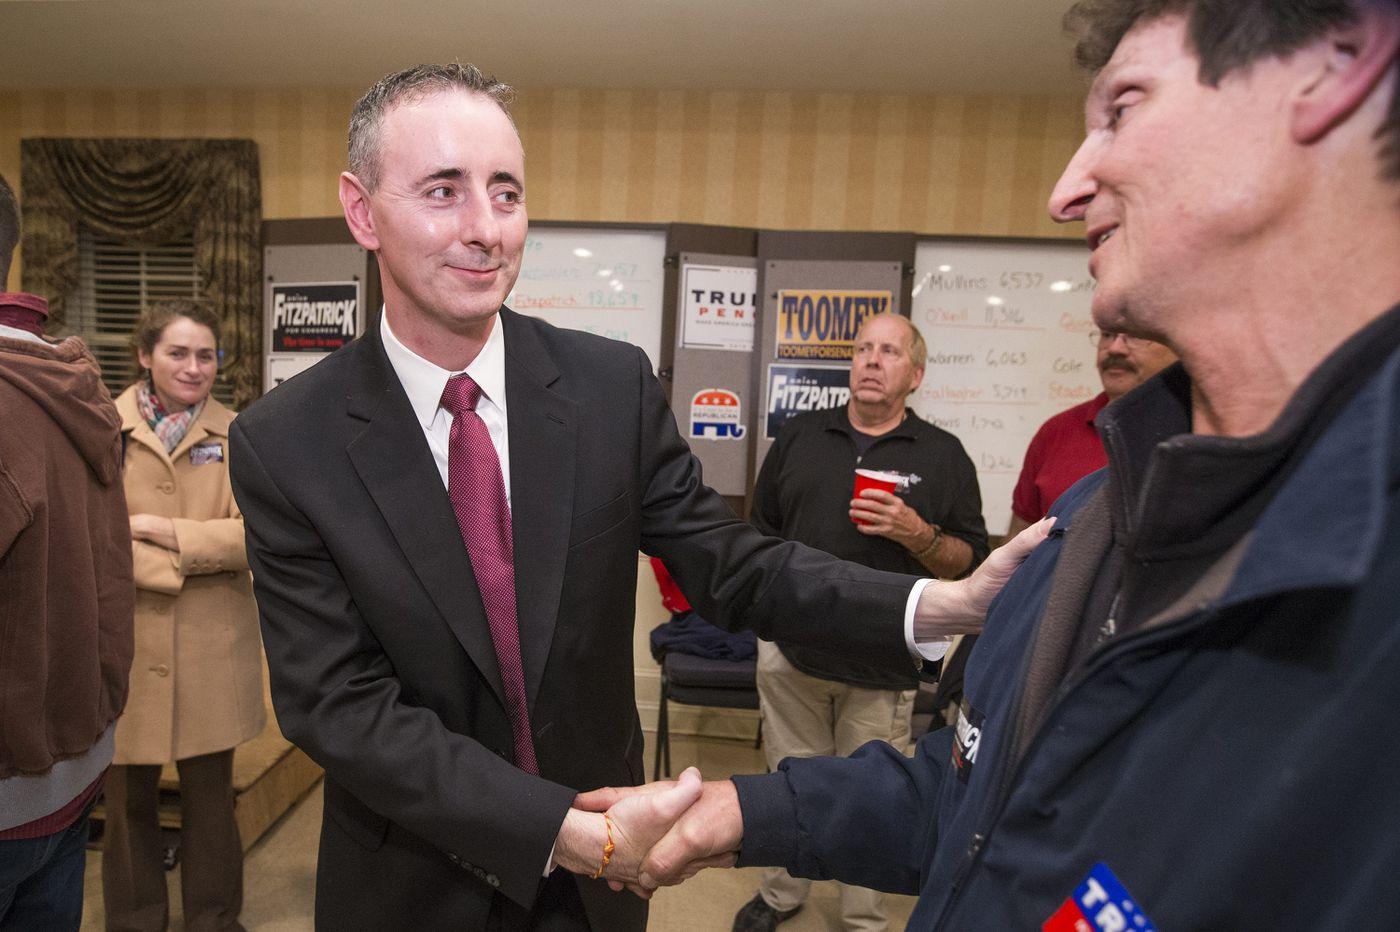 GOP House candidate wins big gun-control endorsement, but activists cry foul | Clout